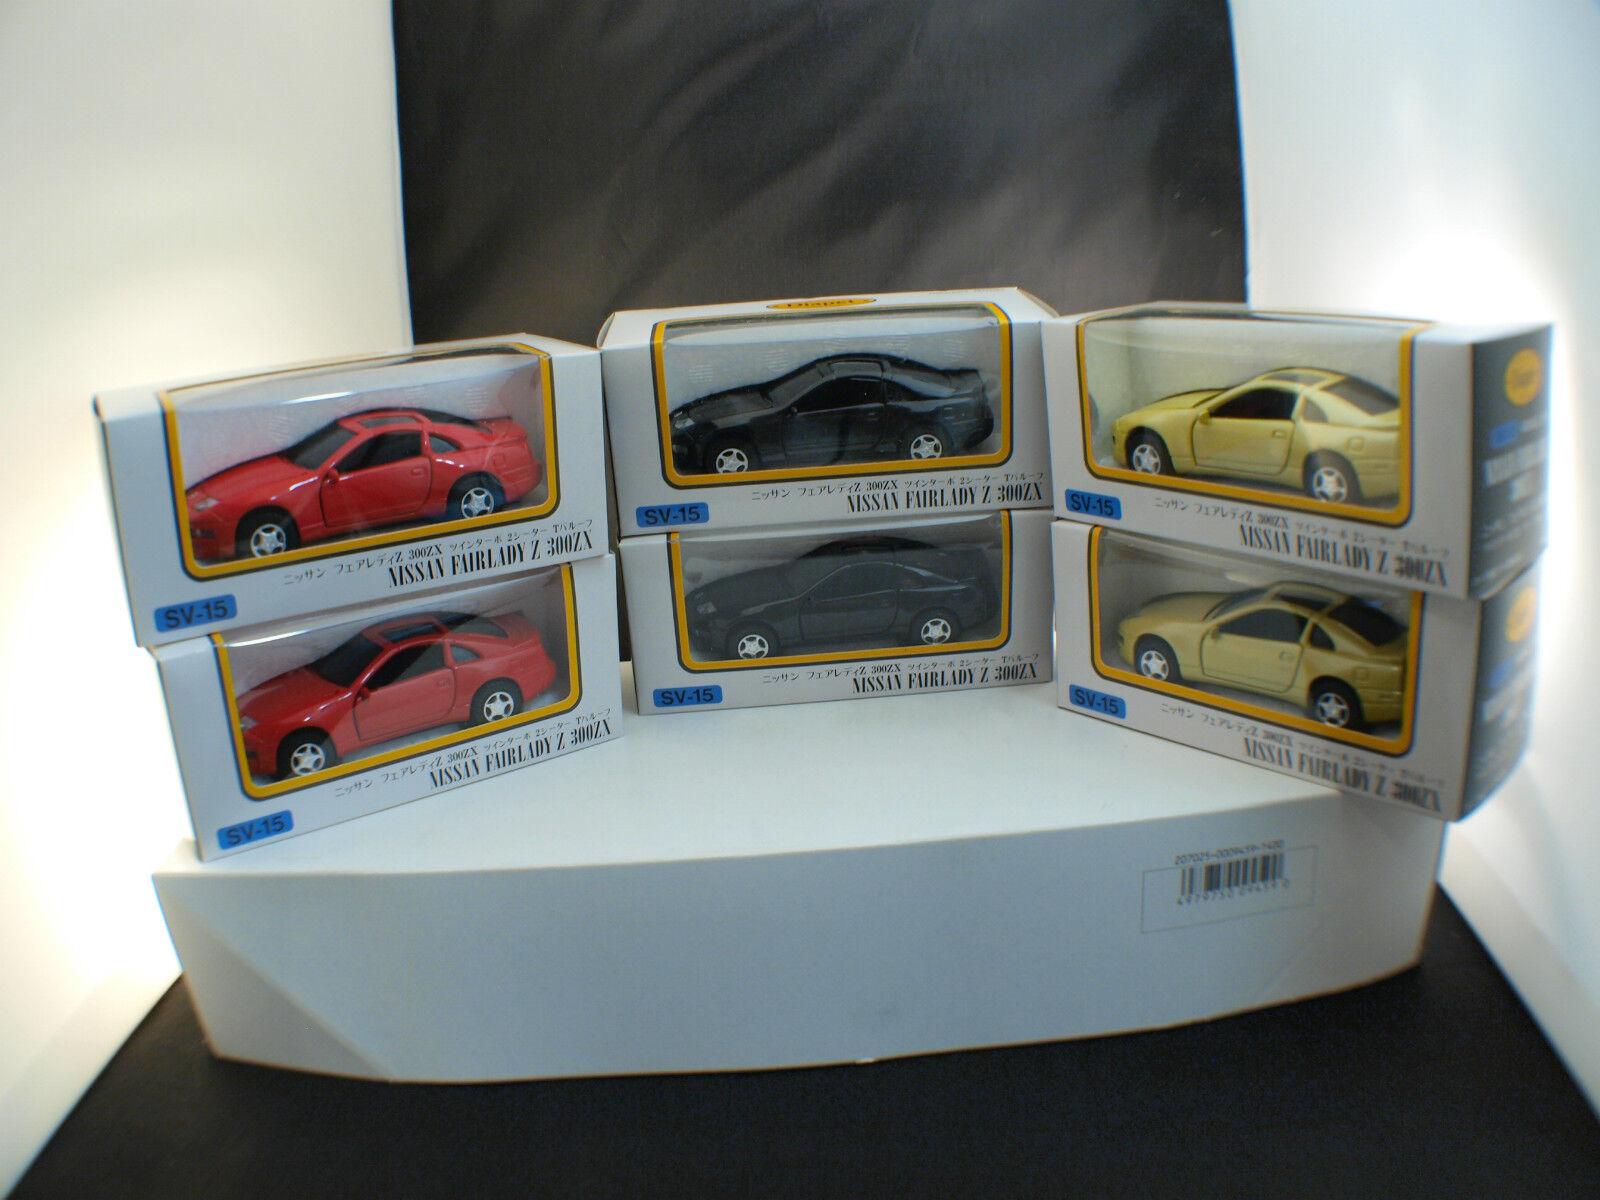 Yonezawa Toys Diapet Japan Sv-15 Boxset Nissan Fairadyz 300zx Box Retailer